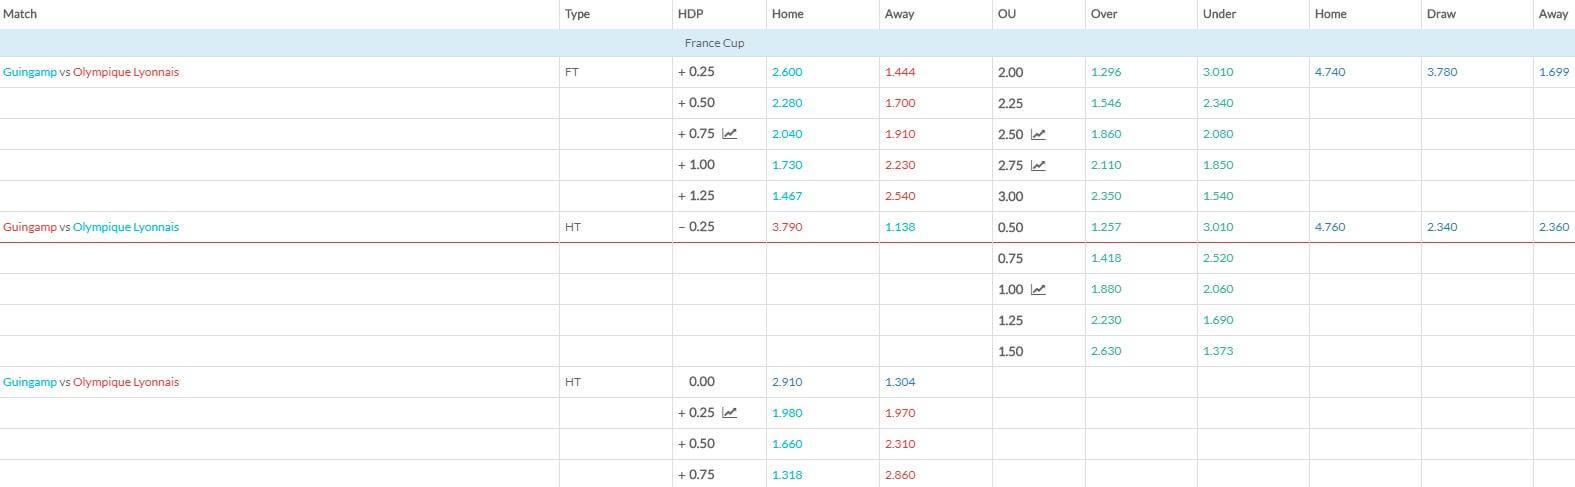 Guingamp v Lyon match betting odds 070219